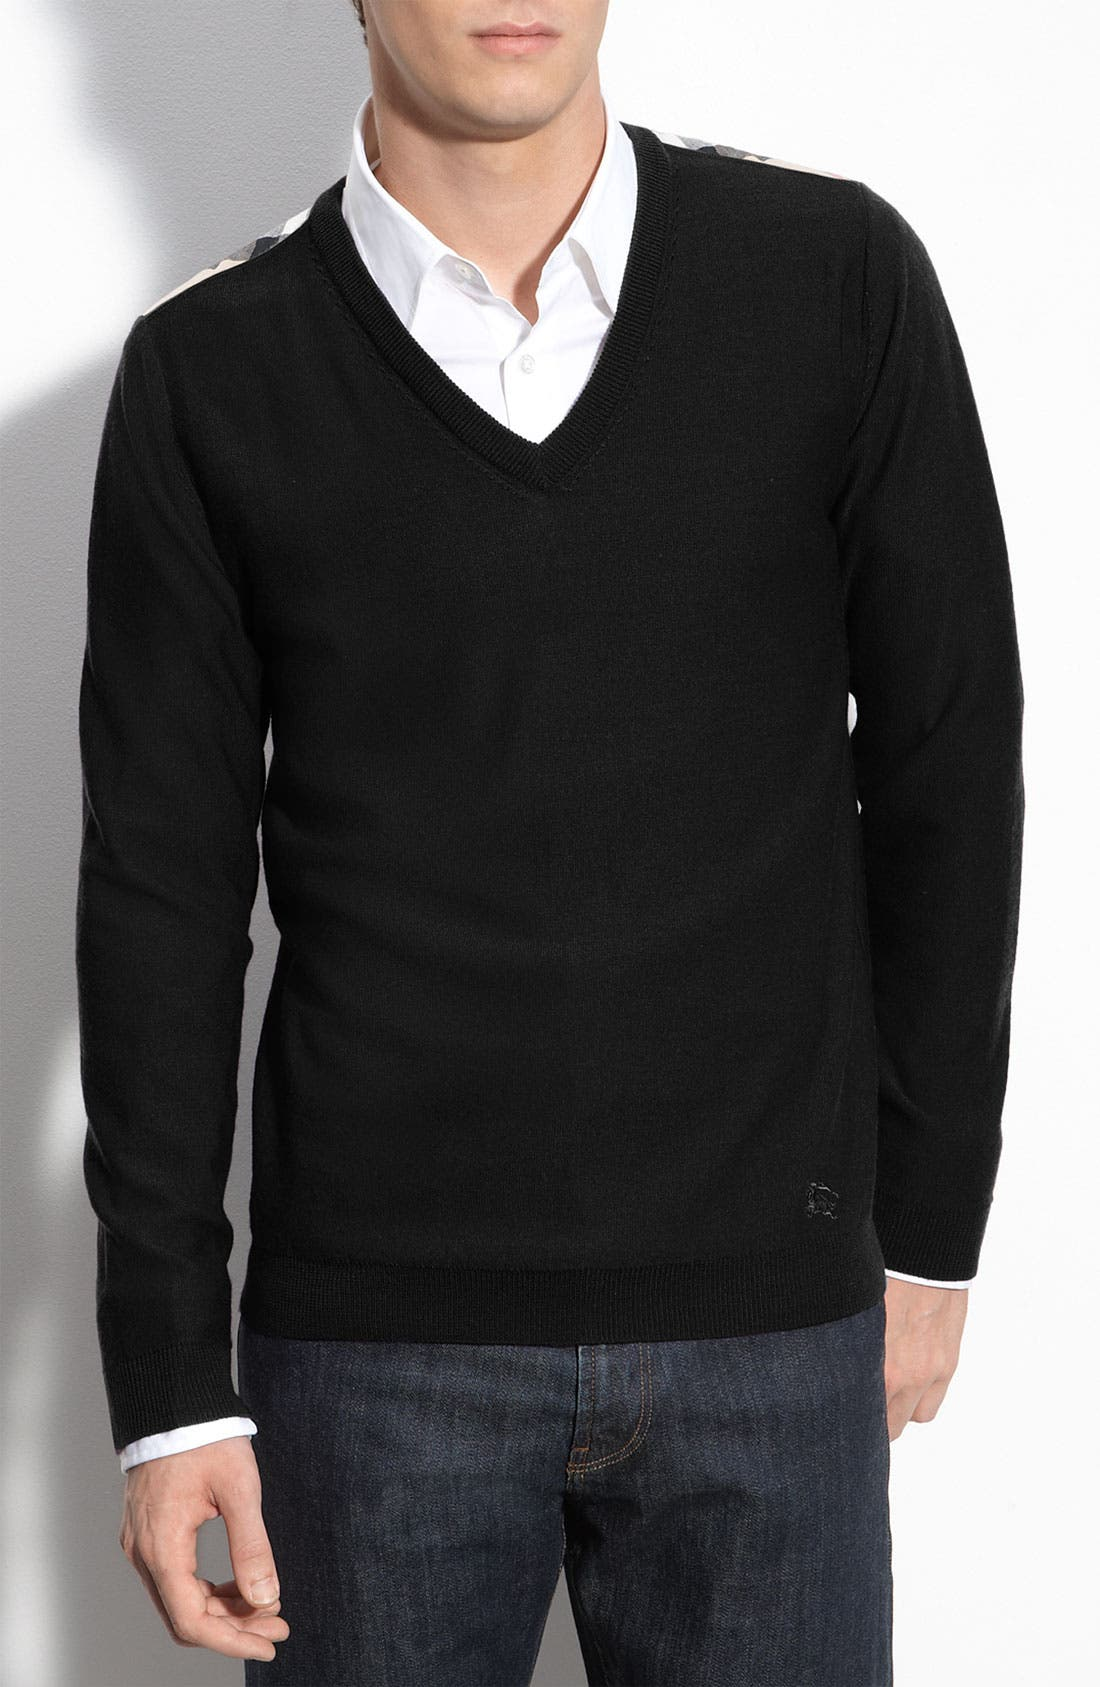 Alternate Image 1 Selected - Burberry Brit Trim Fit Check Shoulder V-Neck Merino Wool Sweater